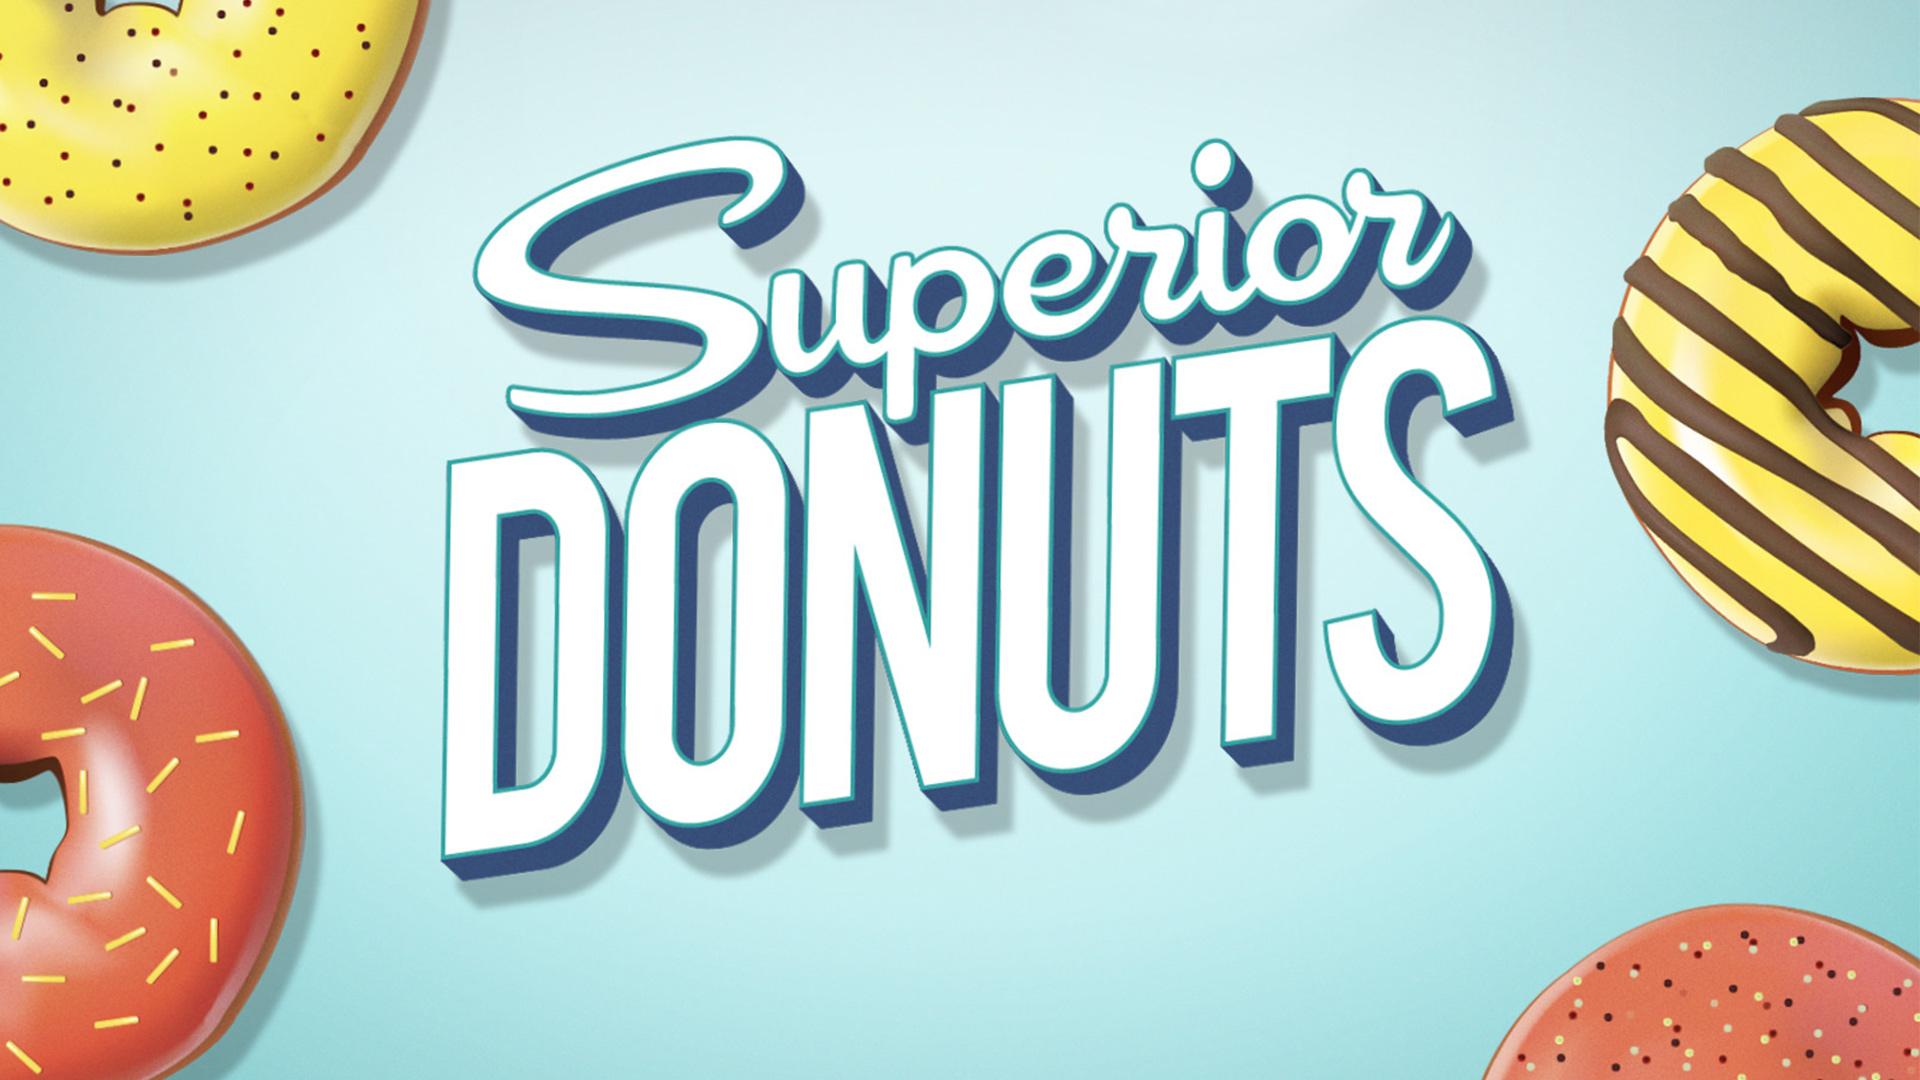 Superior Donuts, Season 1